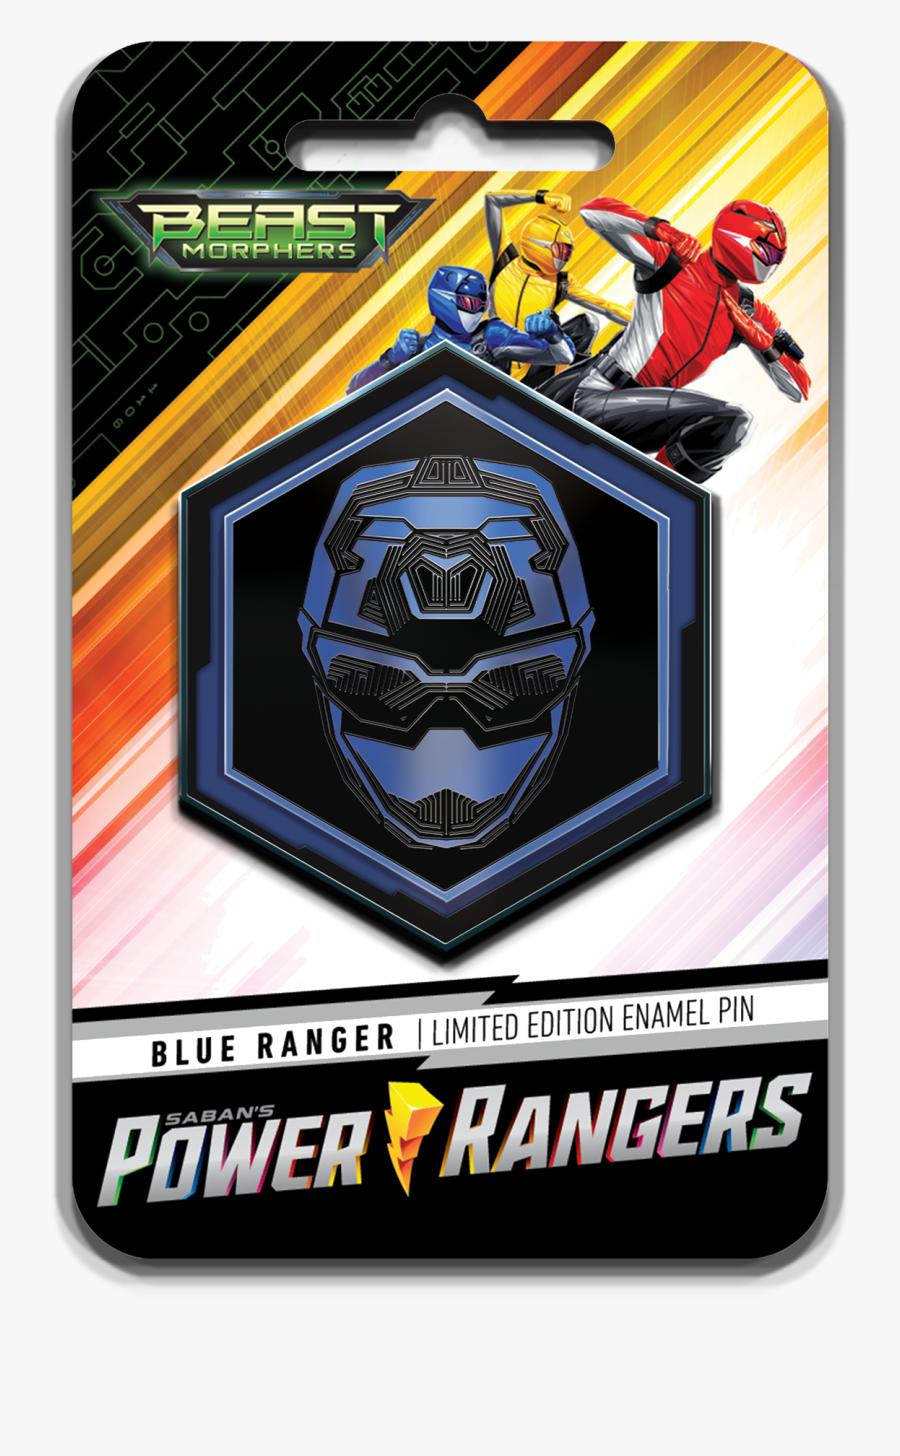 "Beast Morphers Blue Ranger""  Class=""lazyloaded""  Sizes= - Power Rangers Beast Morphers Water Bottle, Transparent Clipart"